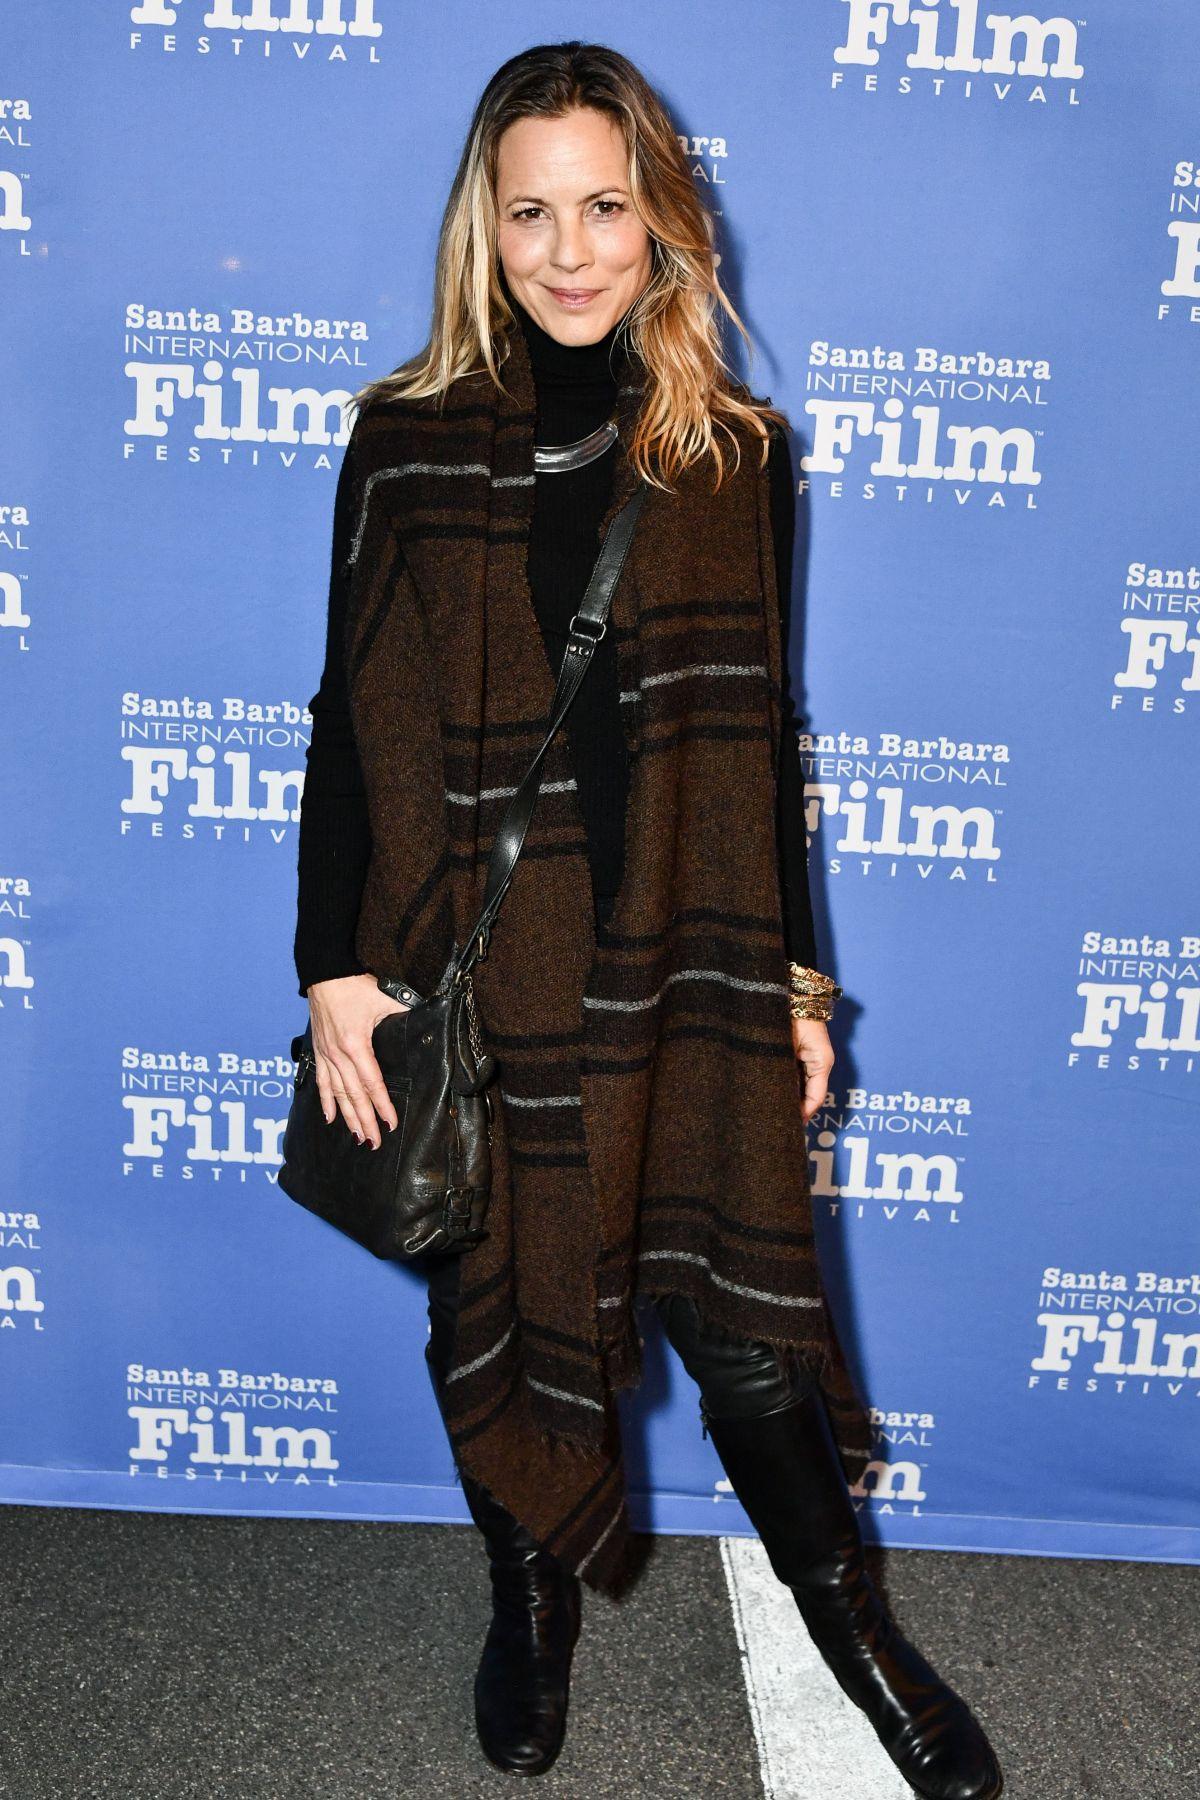 MARIA BELLO at Montecito Award at Santa Barbara International Film Festival 02/08/2017